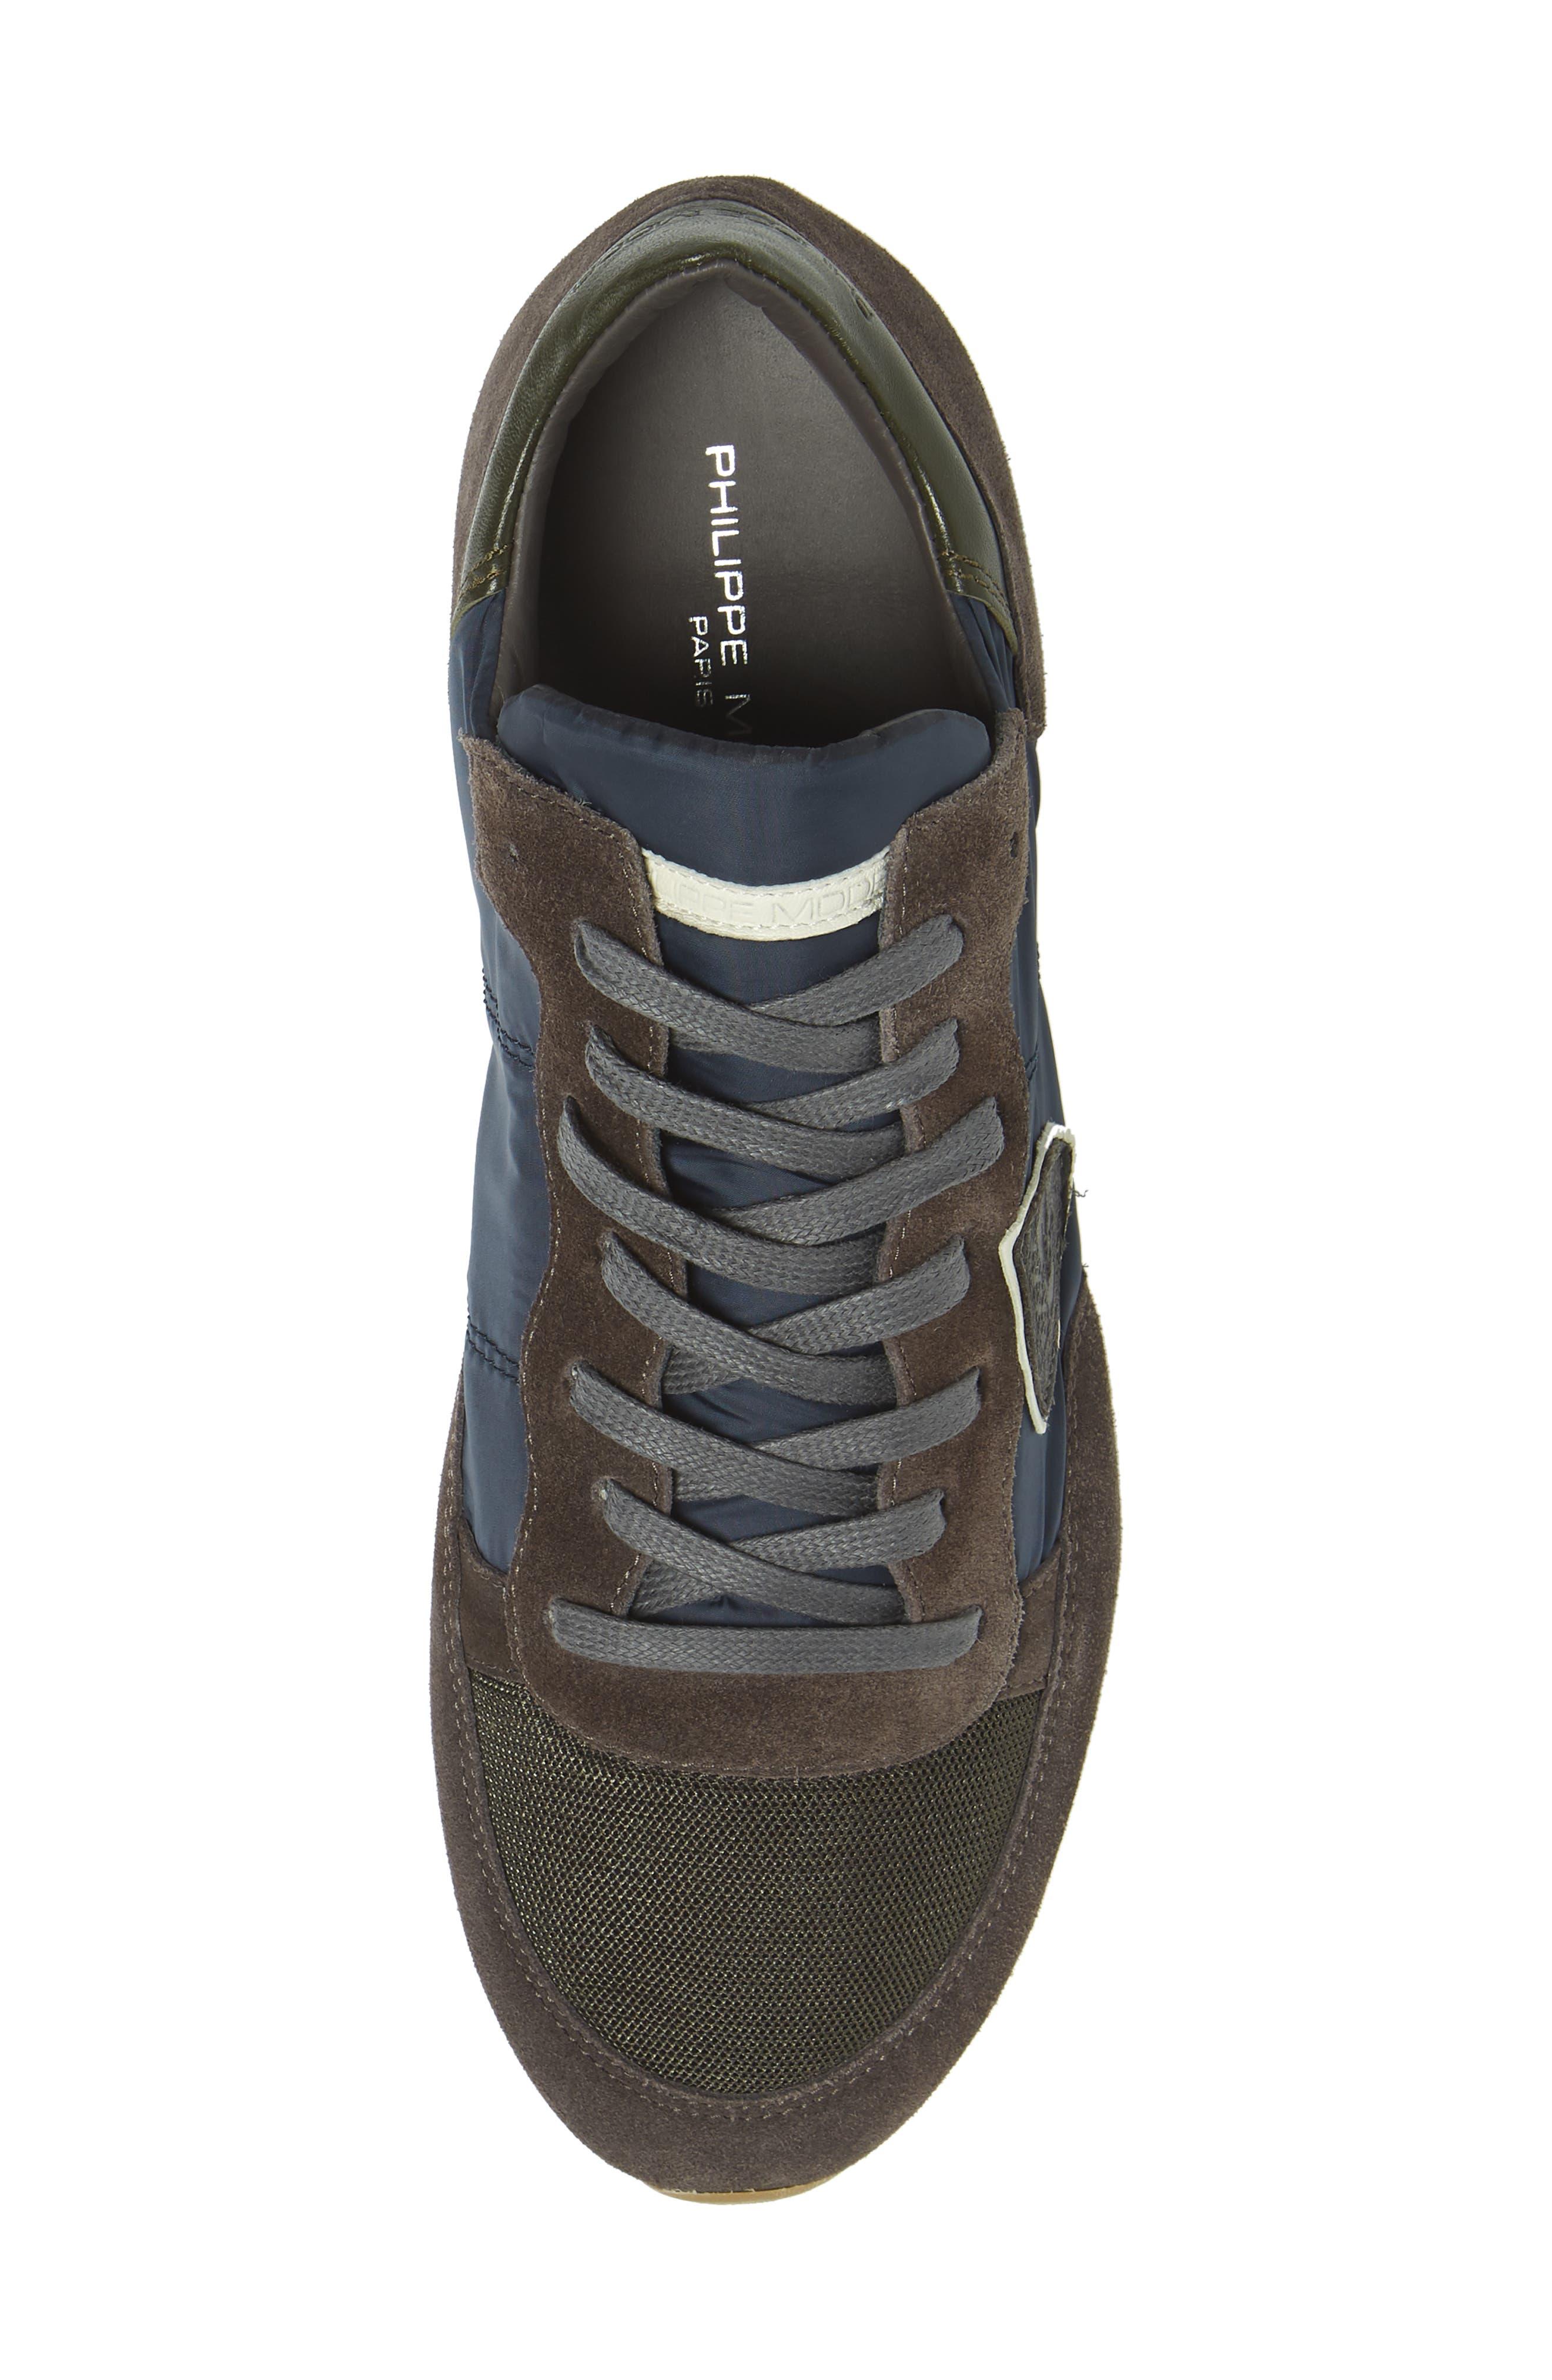 Tropez Low Top Sneaker,                             Alternate thumbnail 5, color,                             020